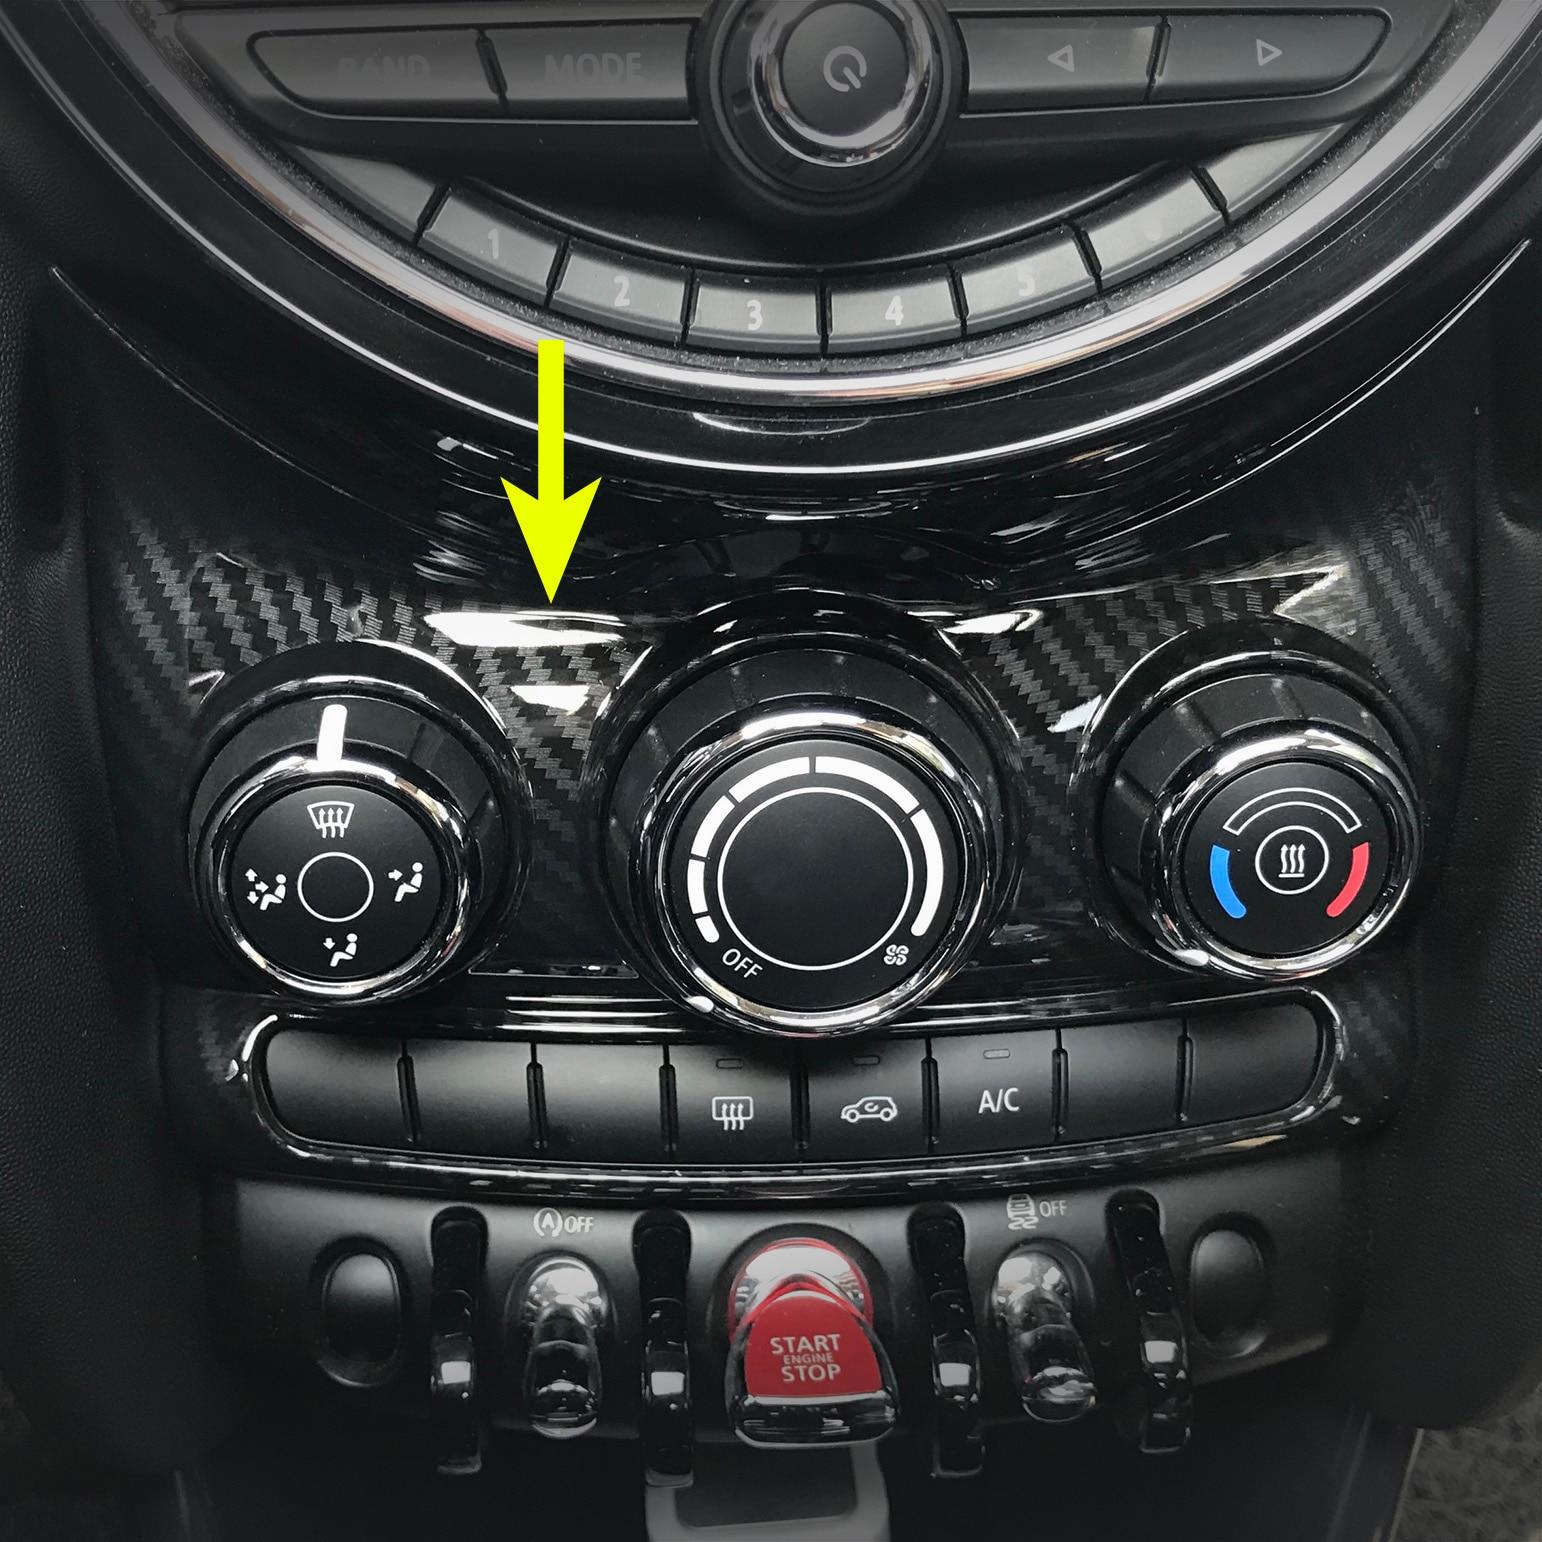 For Mini F55 F56 F57 Dashboard A/C Air Condition Switch